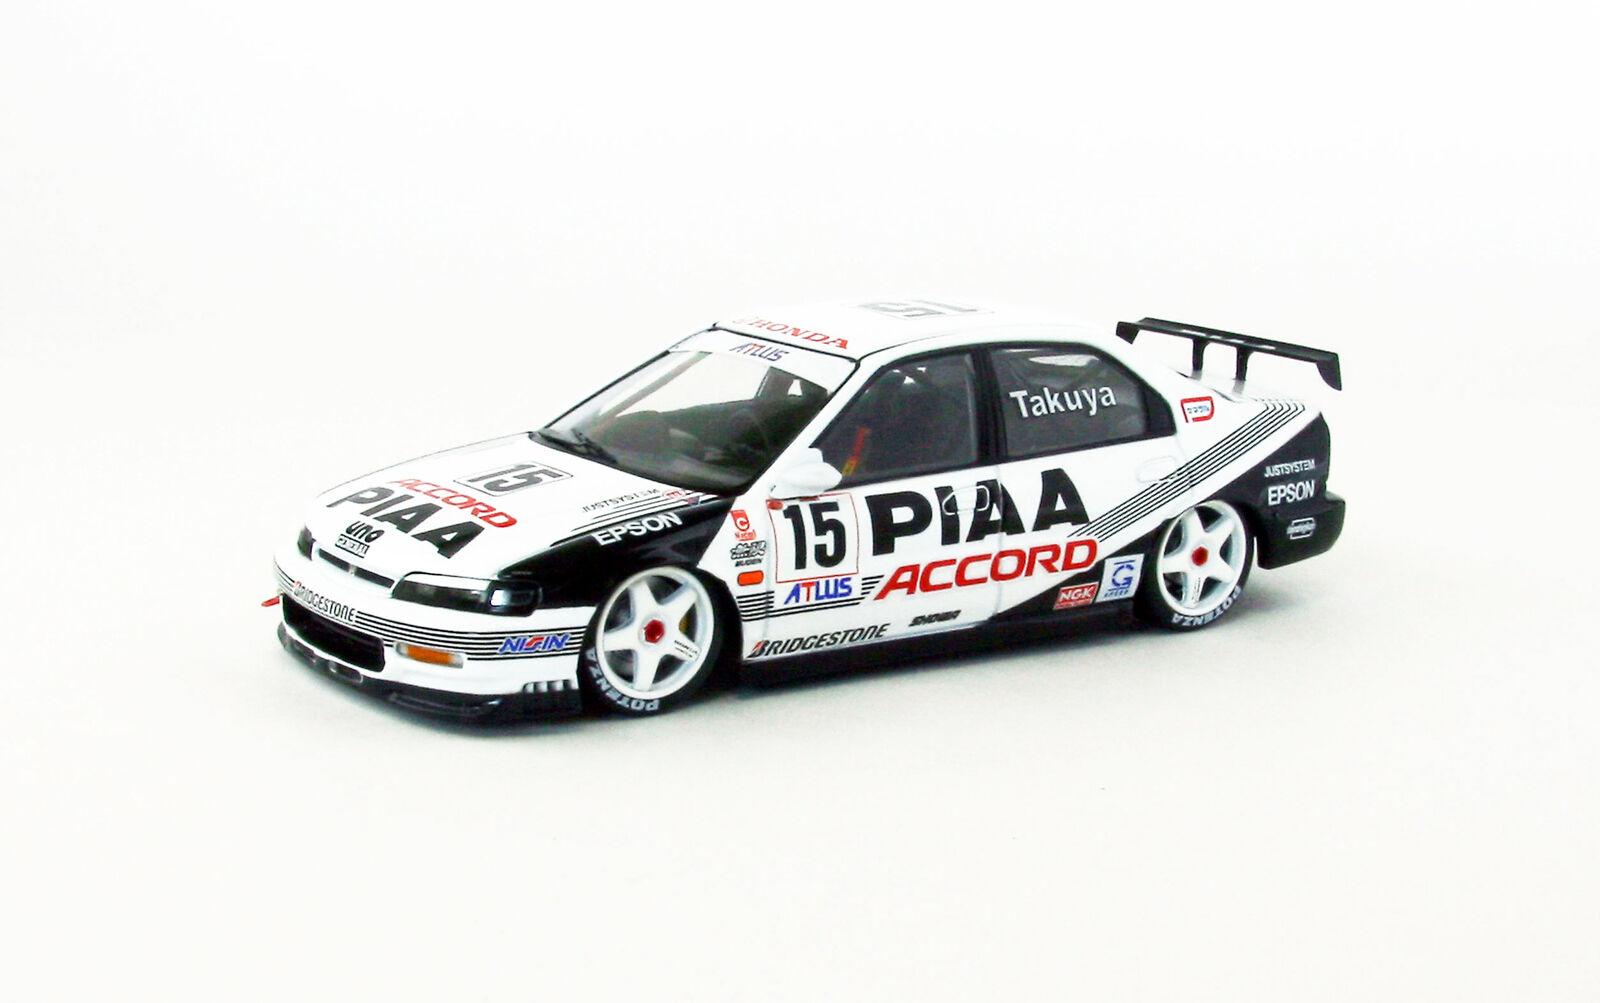 Ebbro 45040 Honda PIAA Mugen Accord #.15 Japan JTCC 1996 1//43 scale